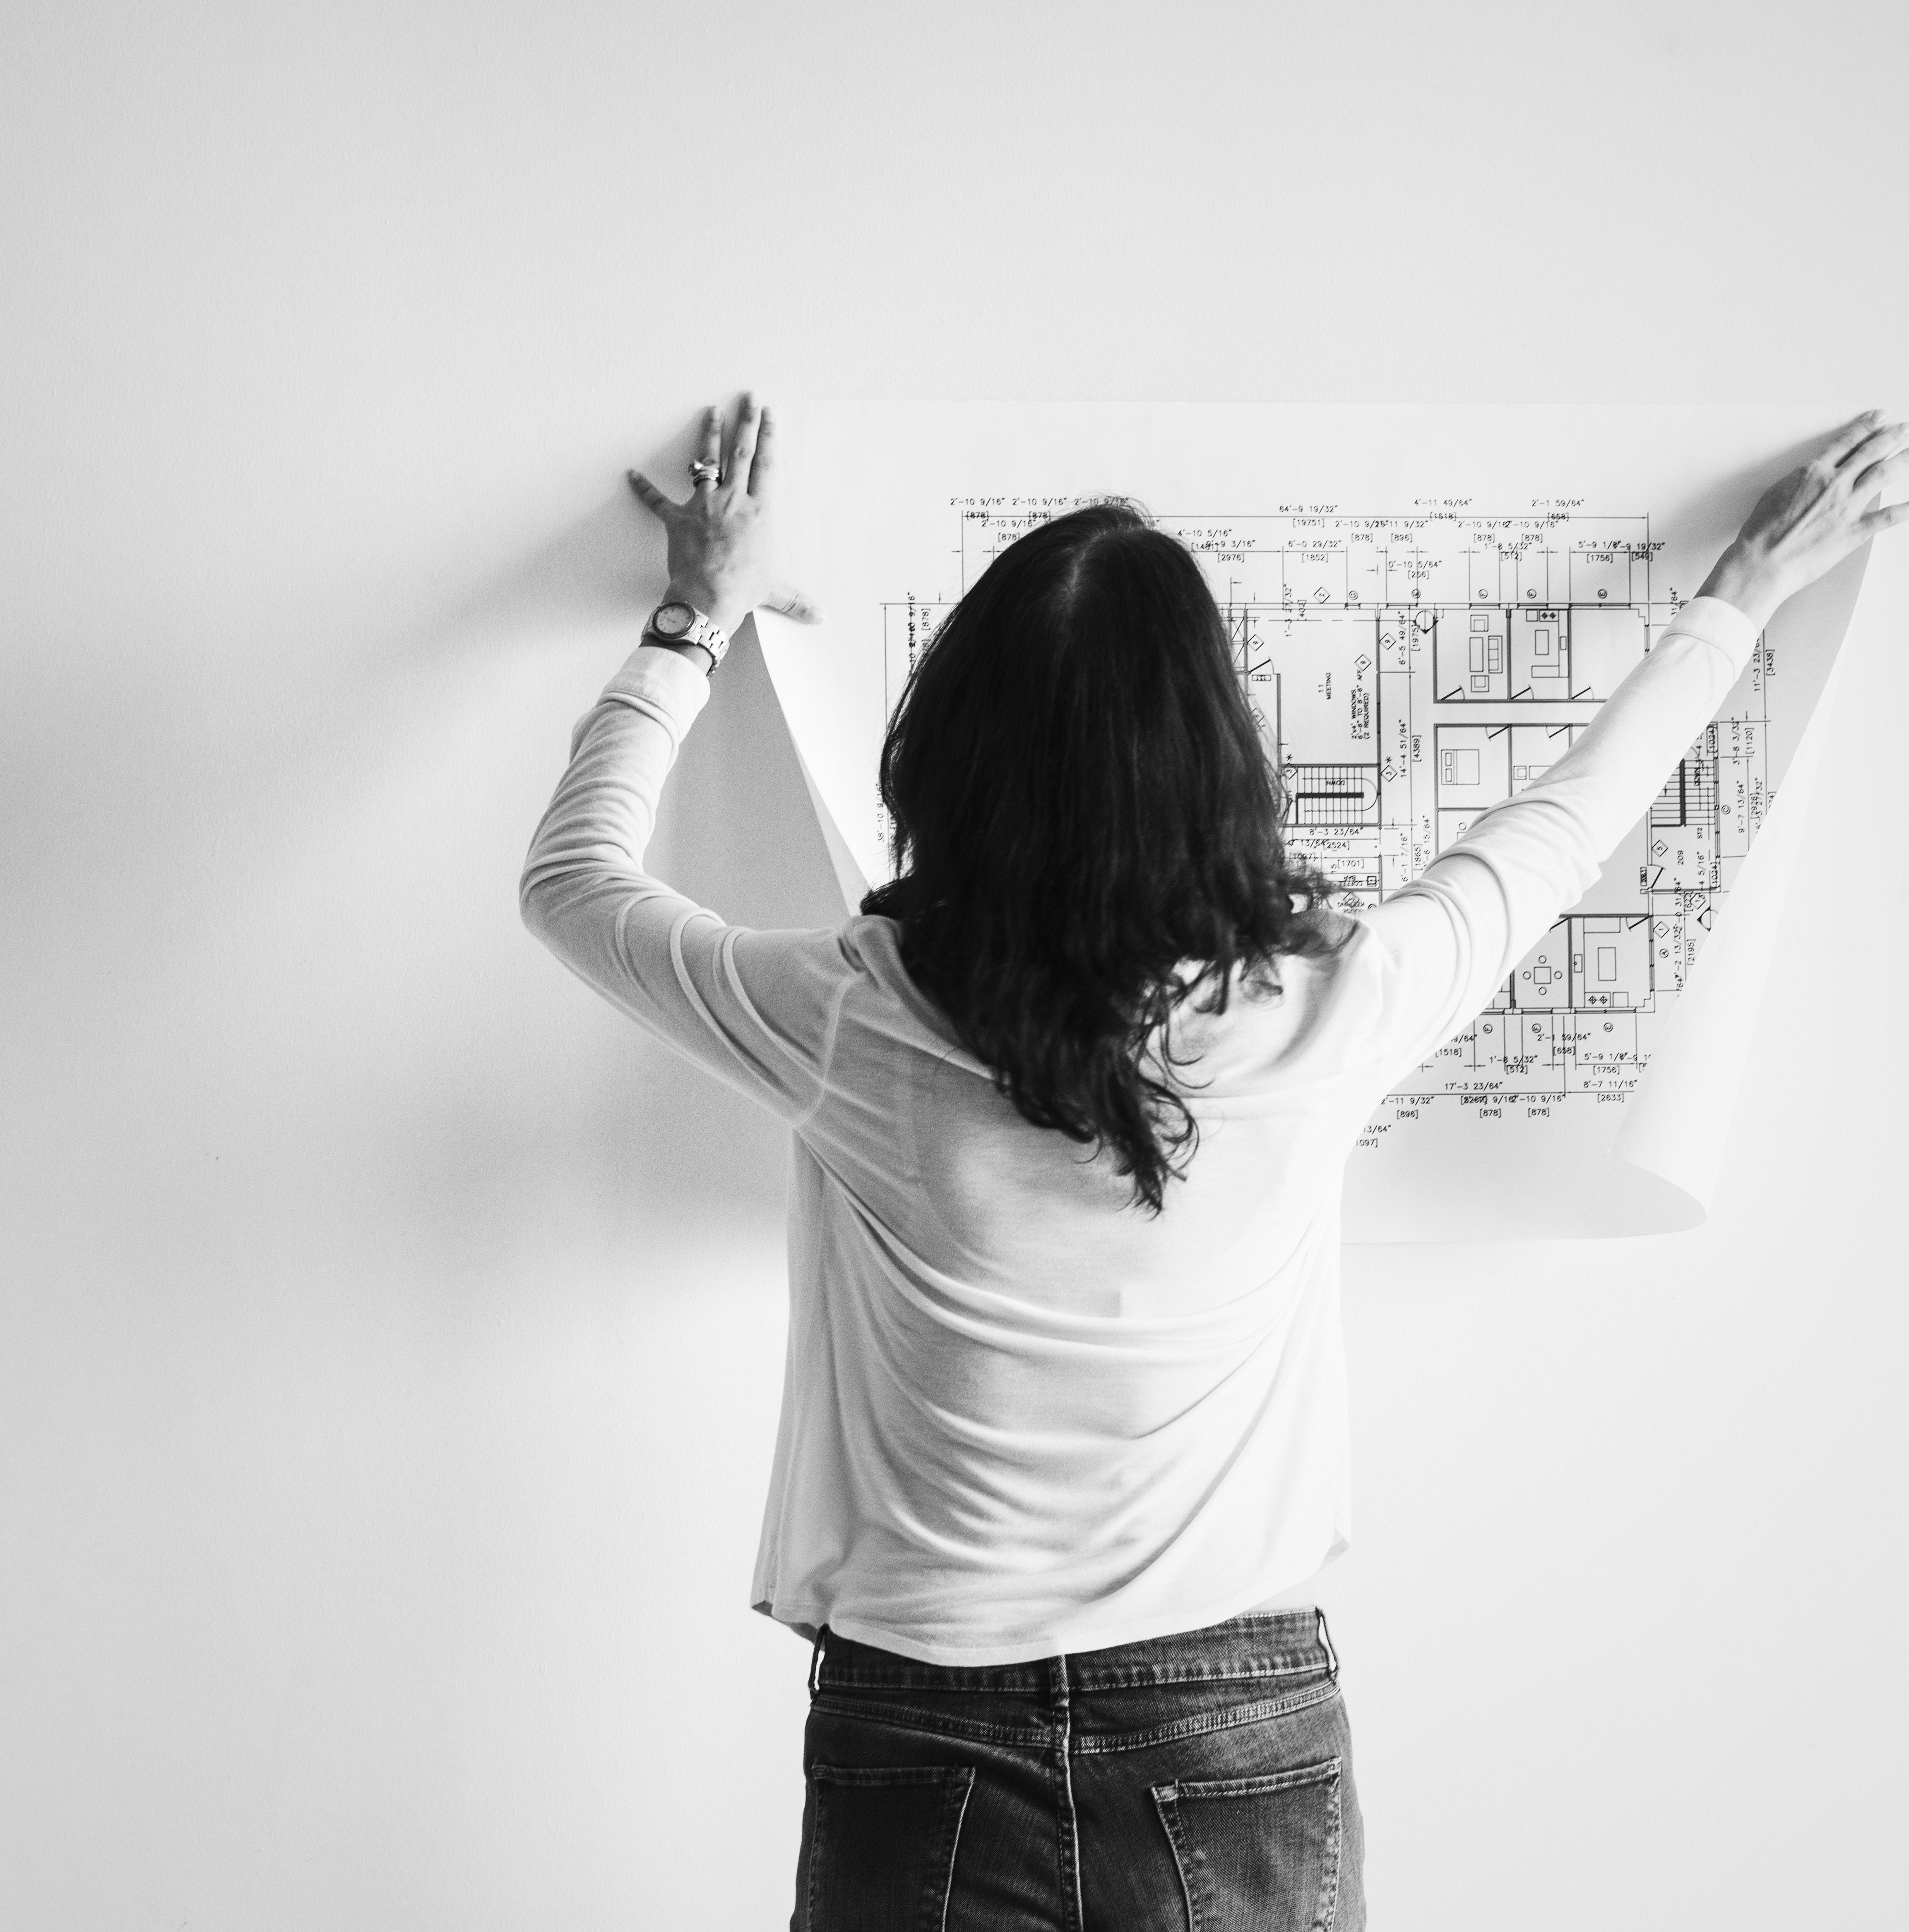 architect-back-black-and-white-1496141